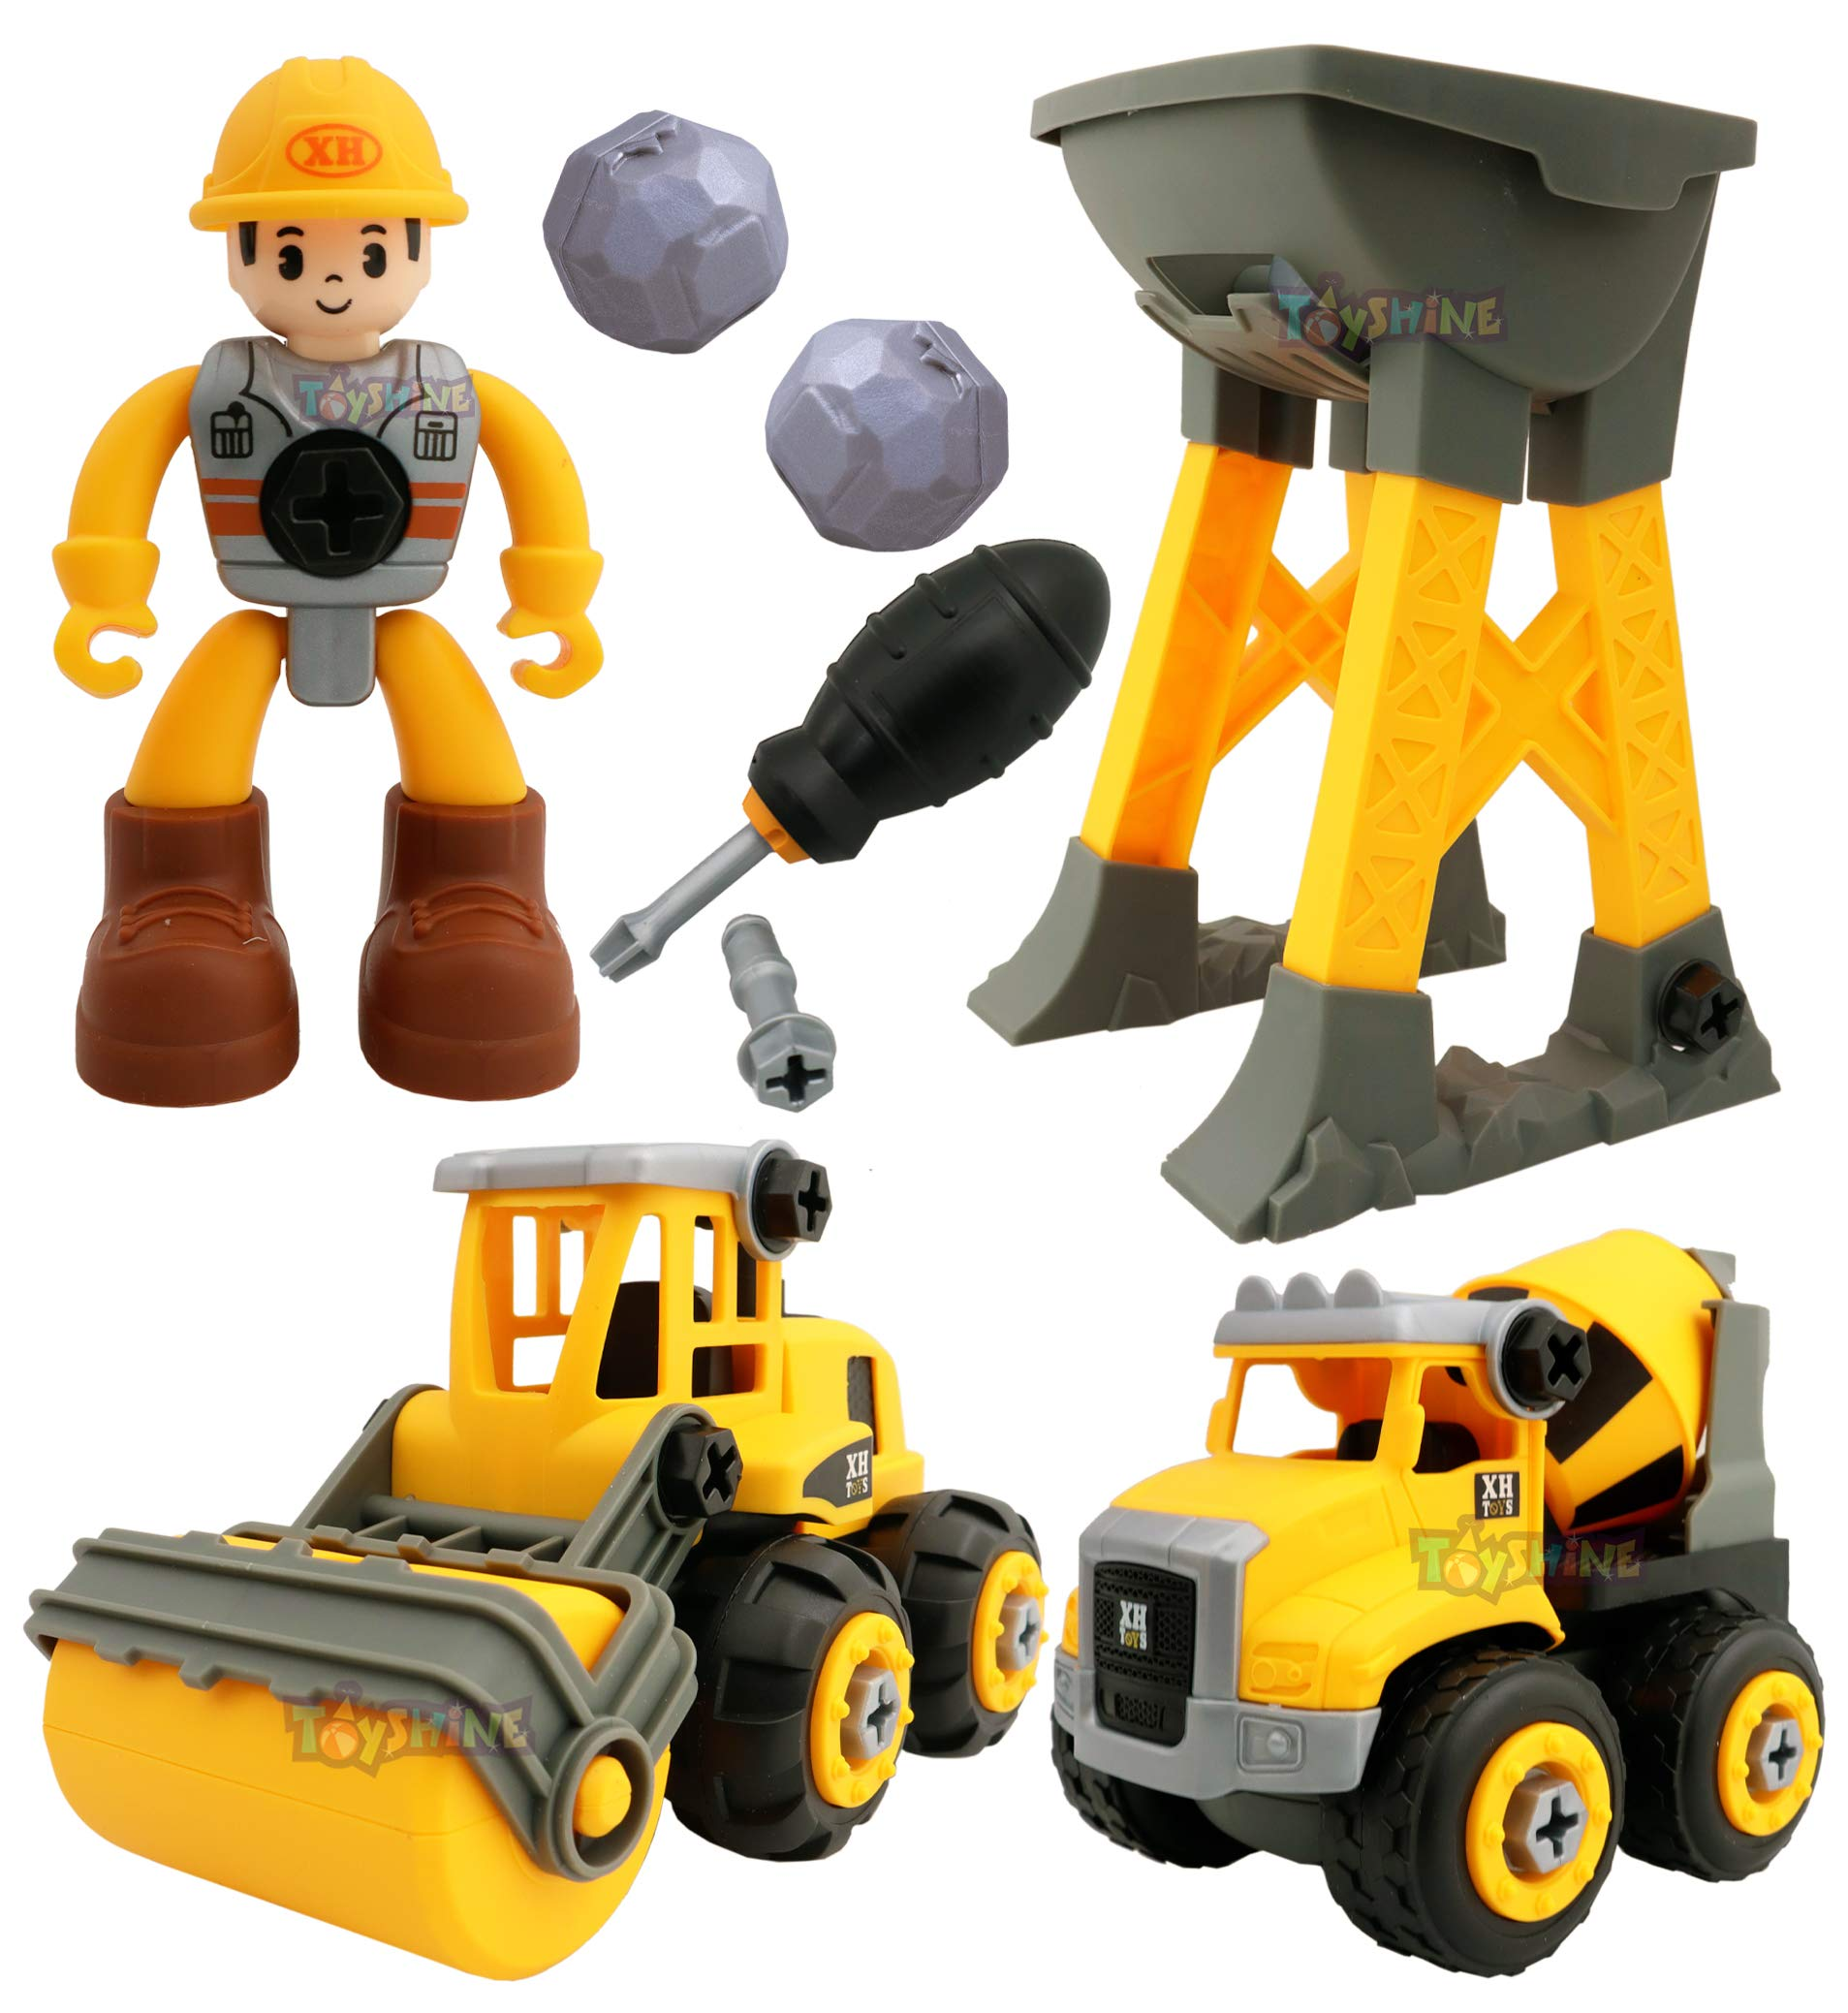 Toyshine 8 Pcs DIY Take Apart Construction Trucks Playset for 3,4,5,6 Year Olds Kids STEM Building Toy